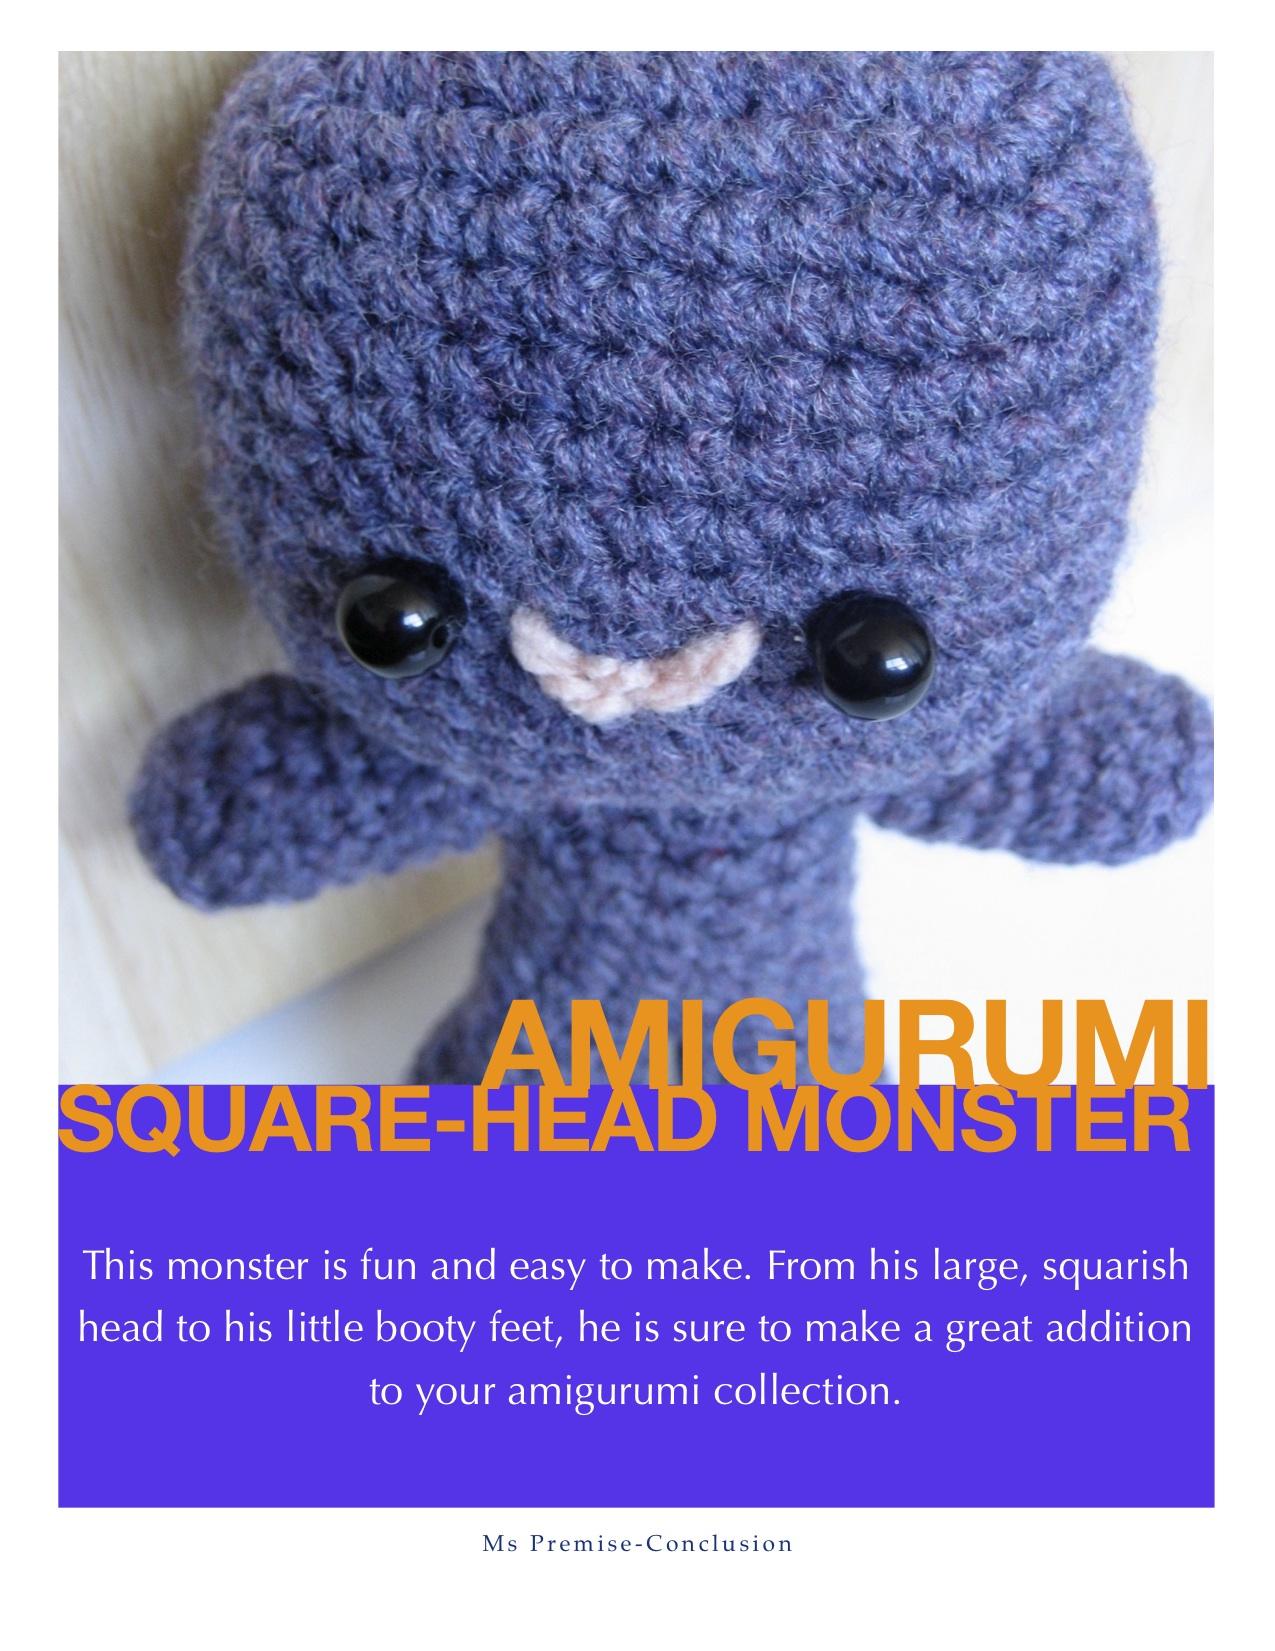 Amigurumi Square-Head Monster Pattern